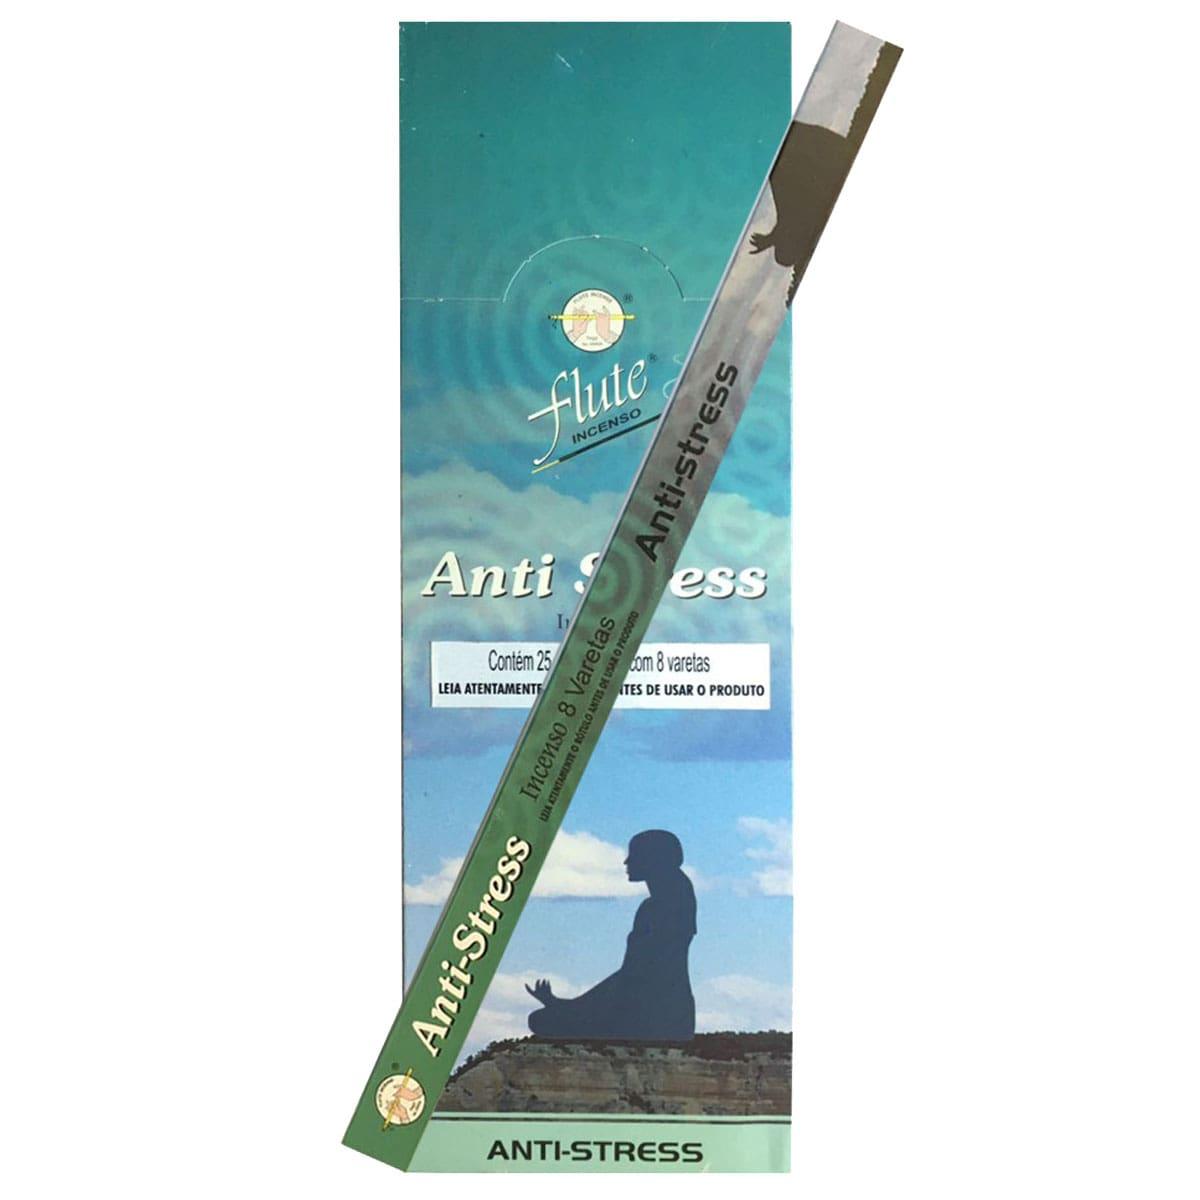 Incenso anti stress flute - central do incenso